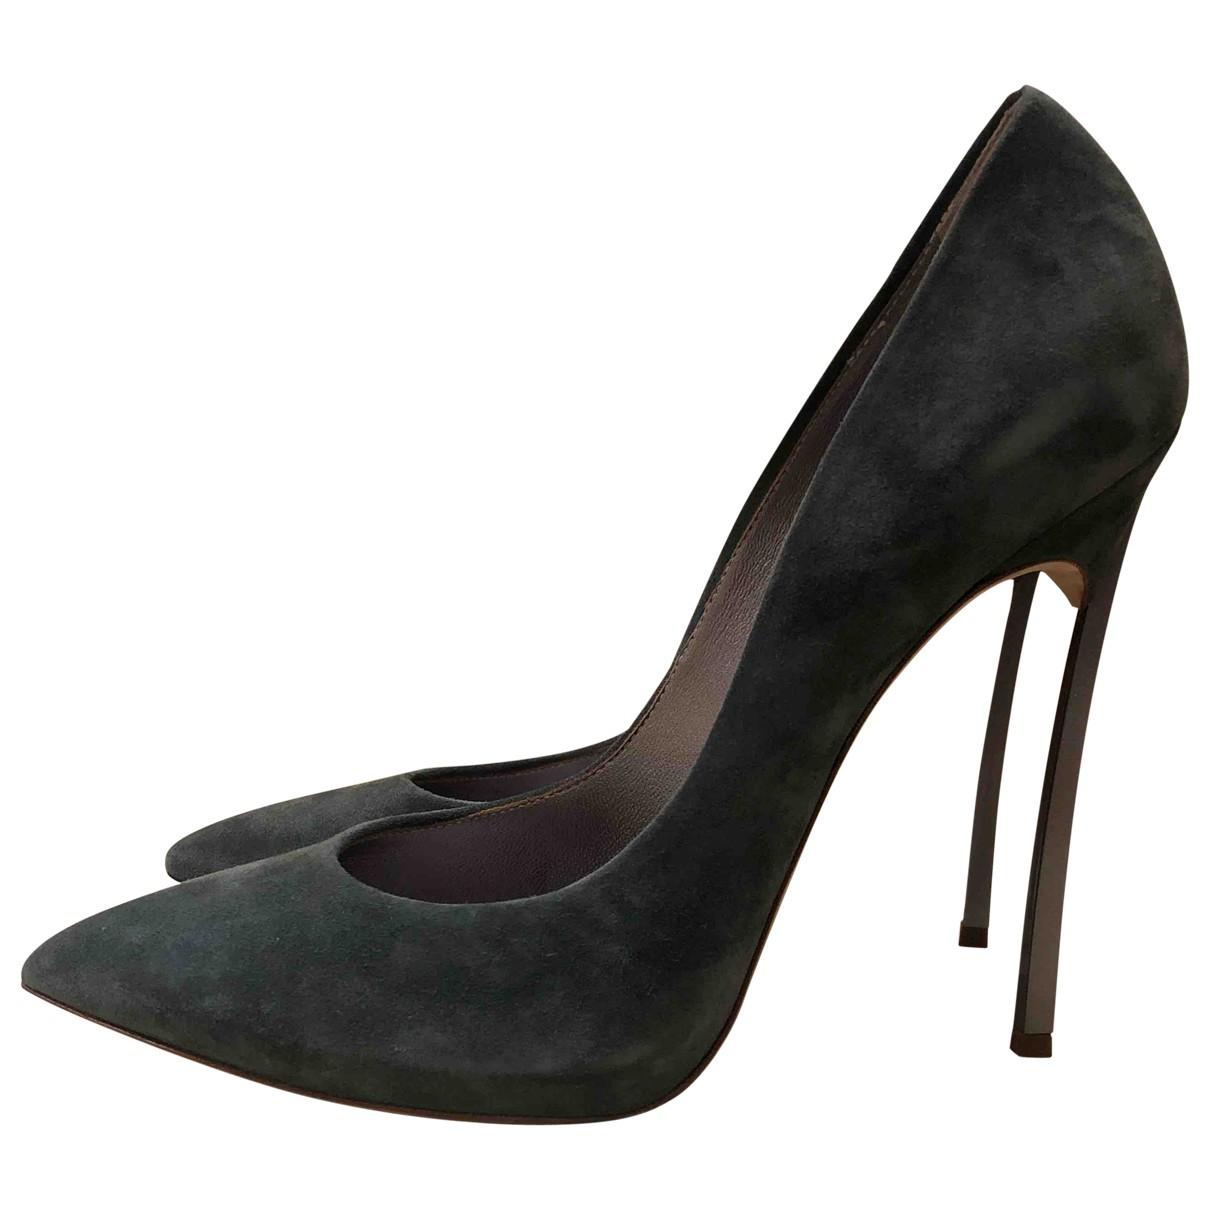 Casadei N Green Suede Heels for Women 9.5 US